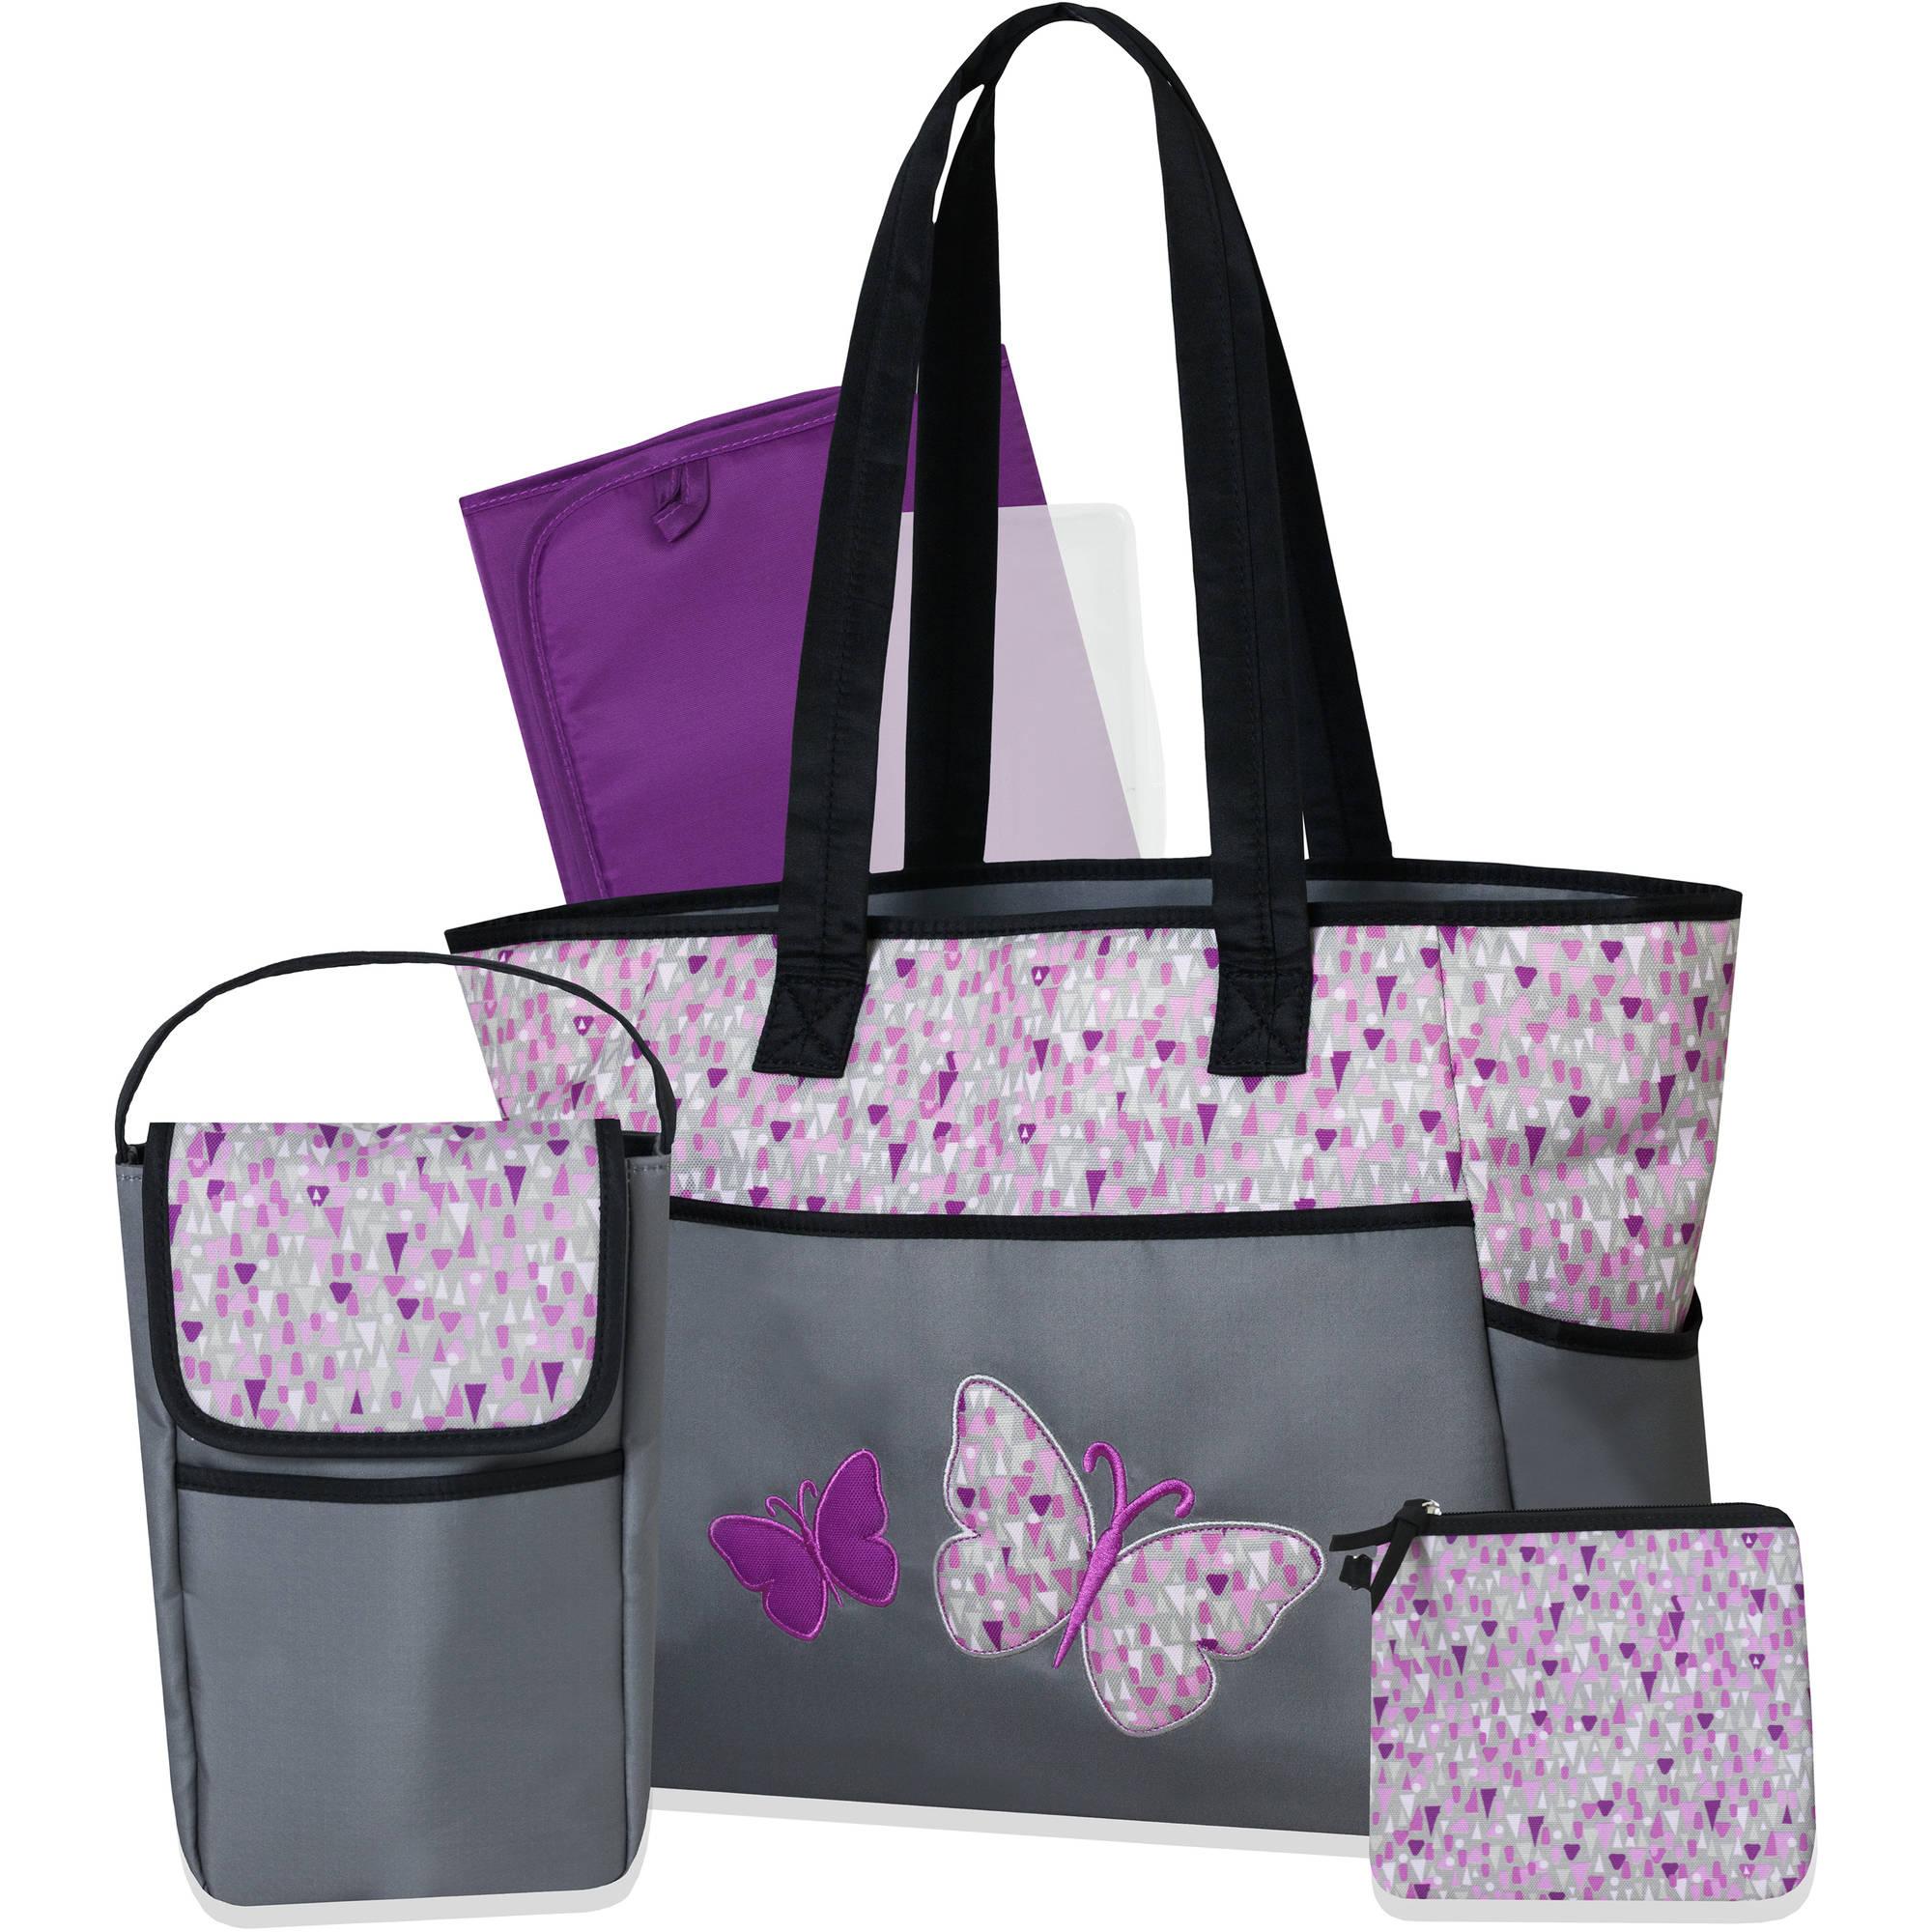 Tender Kisses Sorbet 3 Piece Diaper Bag Set with Bonus Bottle Bag